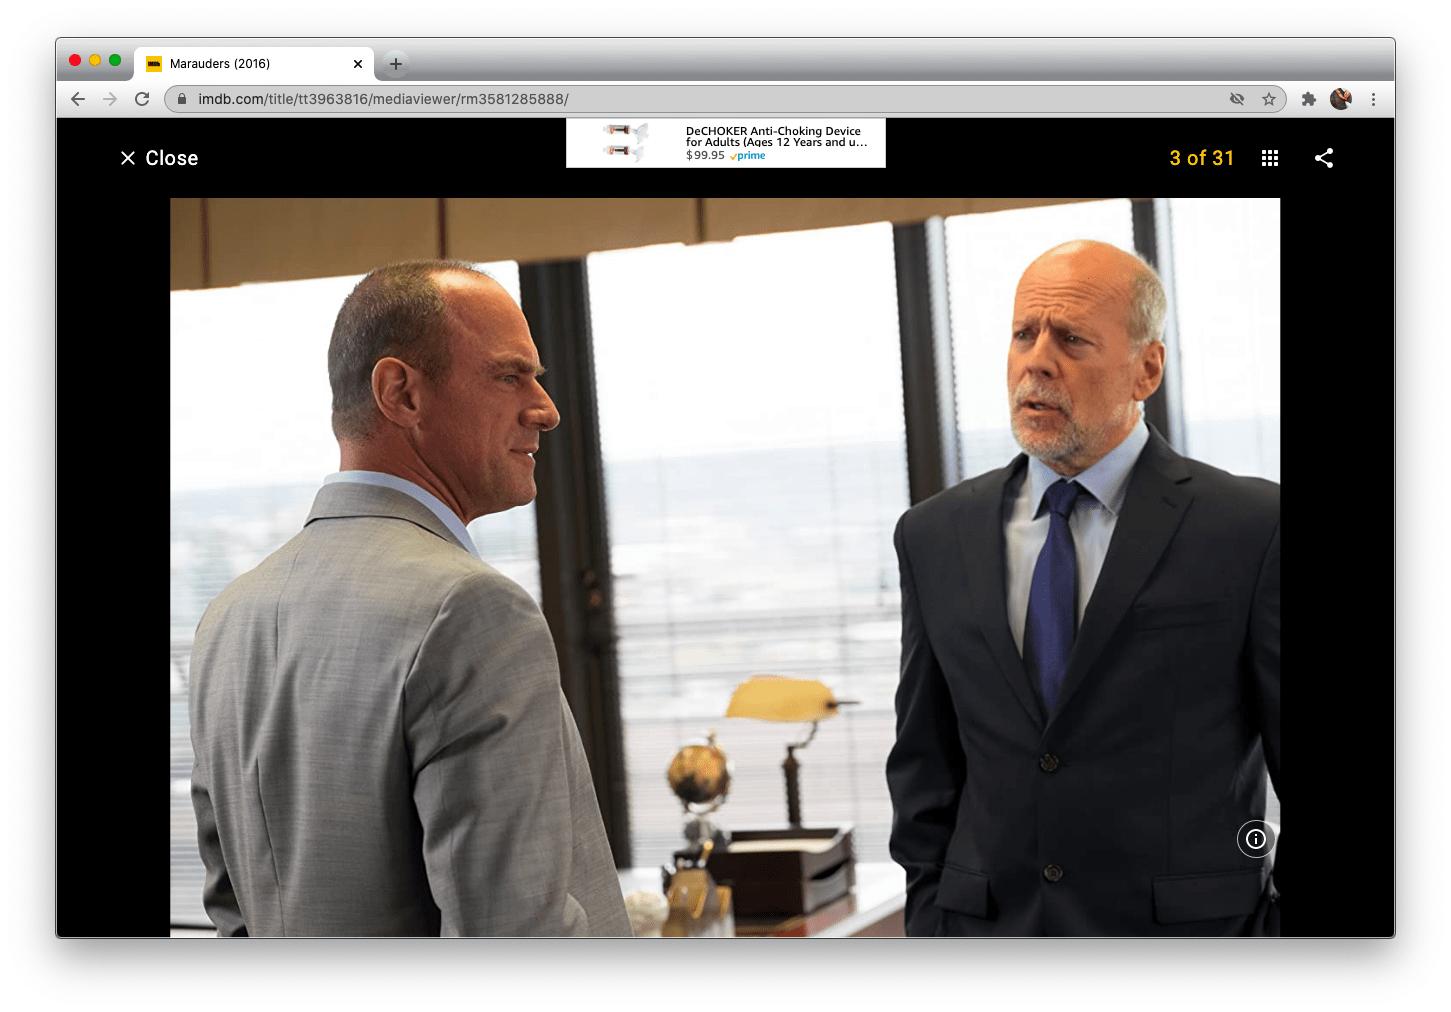 Marauders' principal characters played Chris Meloni and Bruce Willis